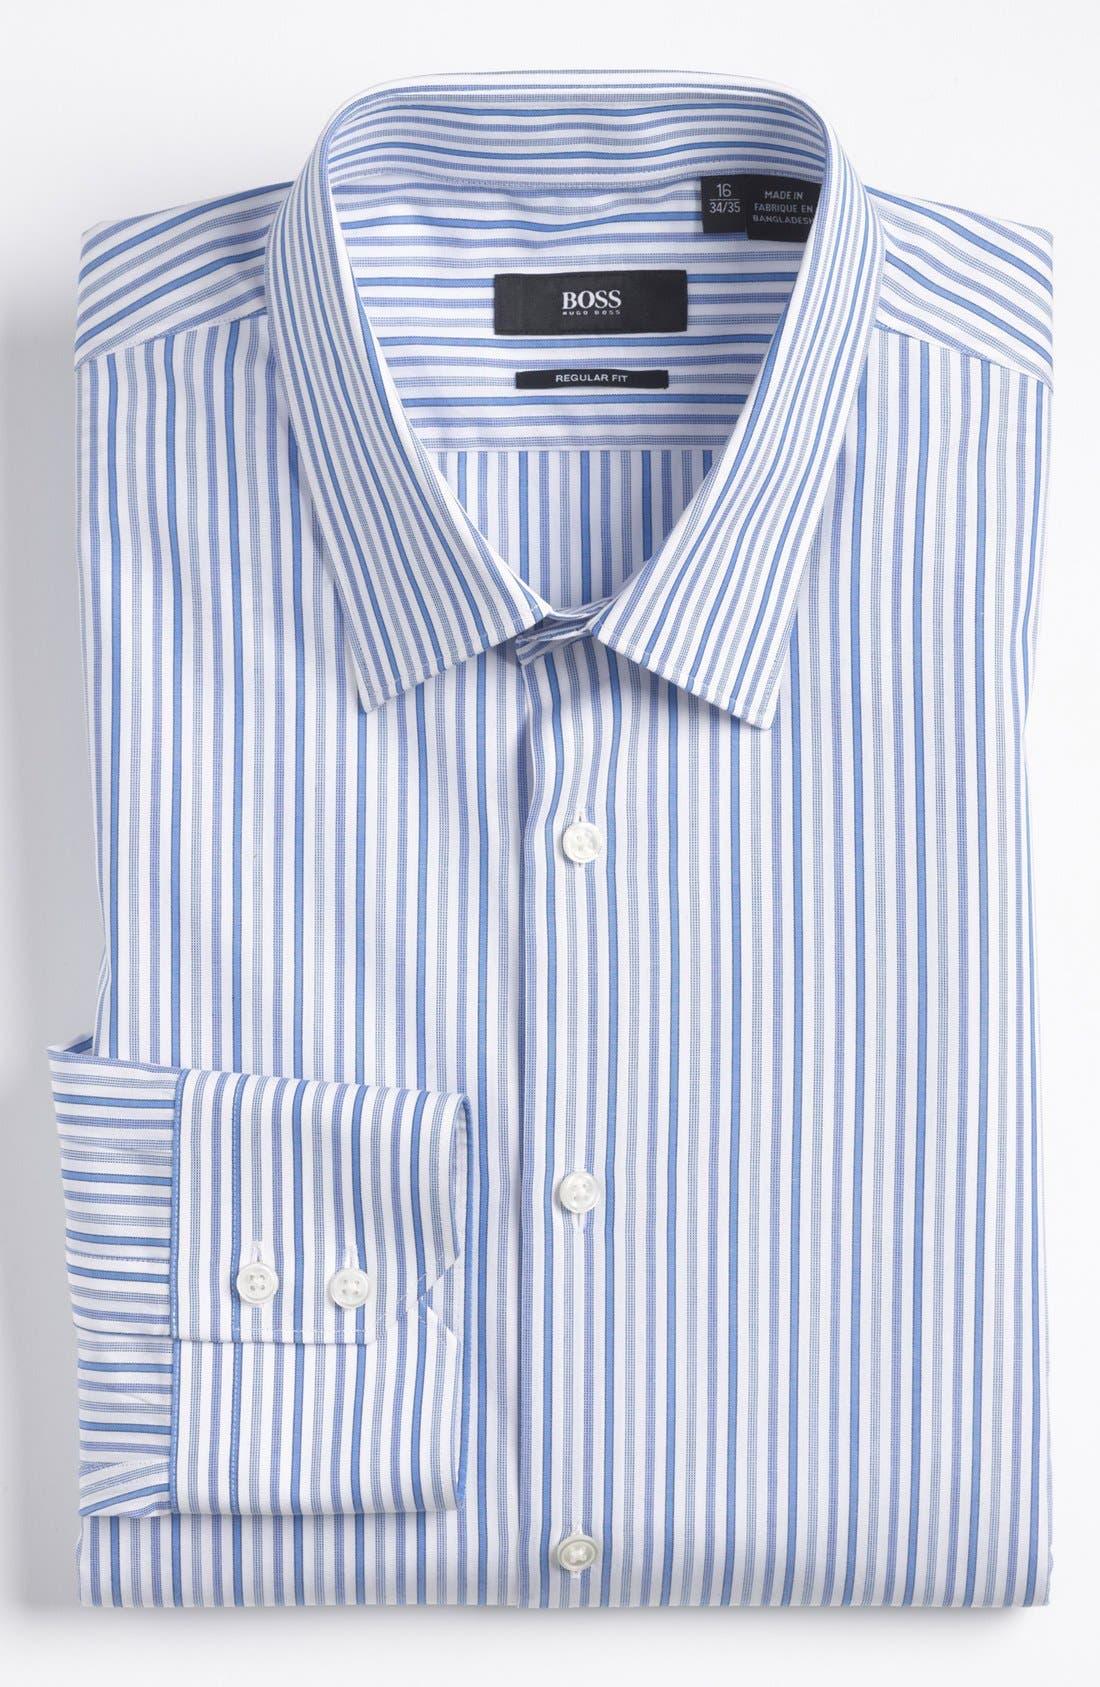 Alternate Image 1 Selected - BOSS HUGO BOSS 'Gulio' Regular Fit Dress Shirt